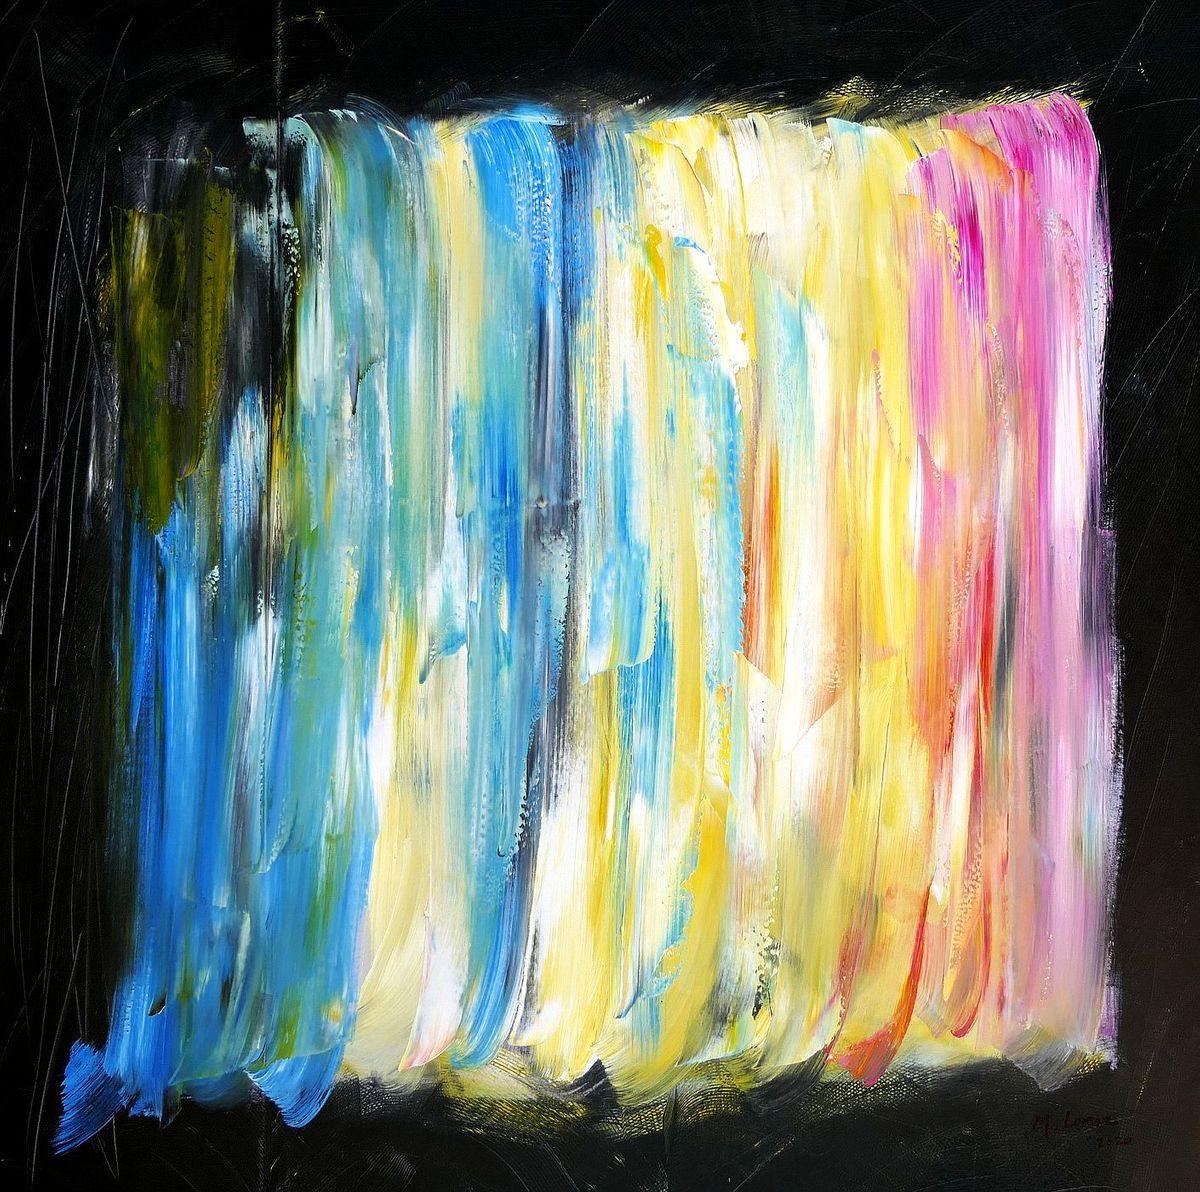 Abstract - Miami art deco yard m98004 120x120cm Ölbild handgemalt